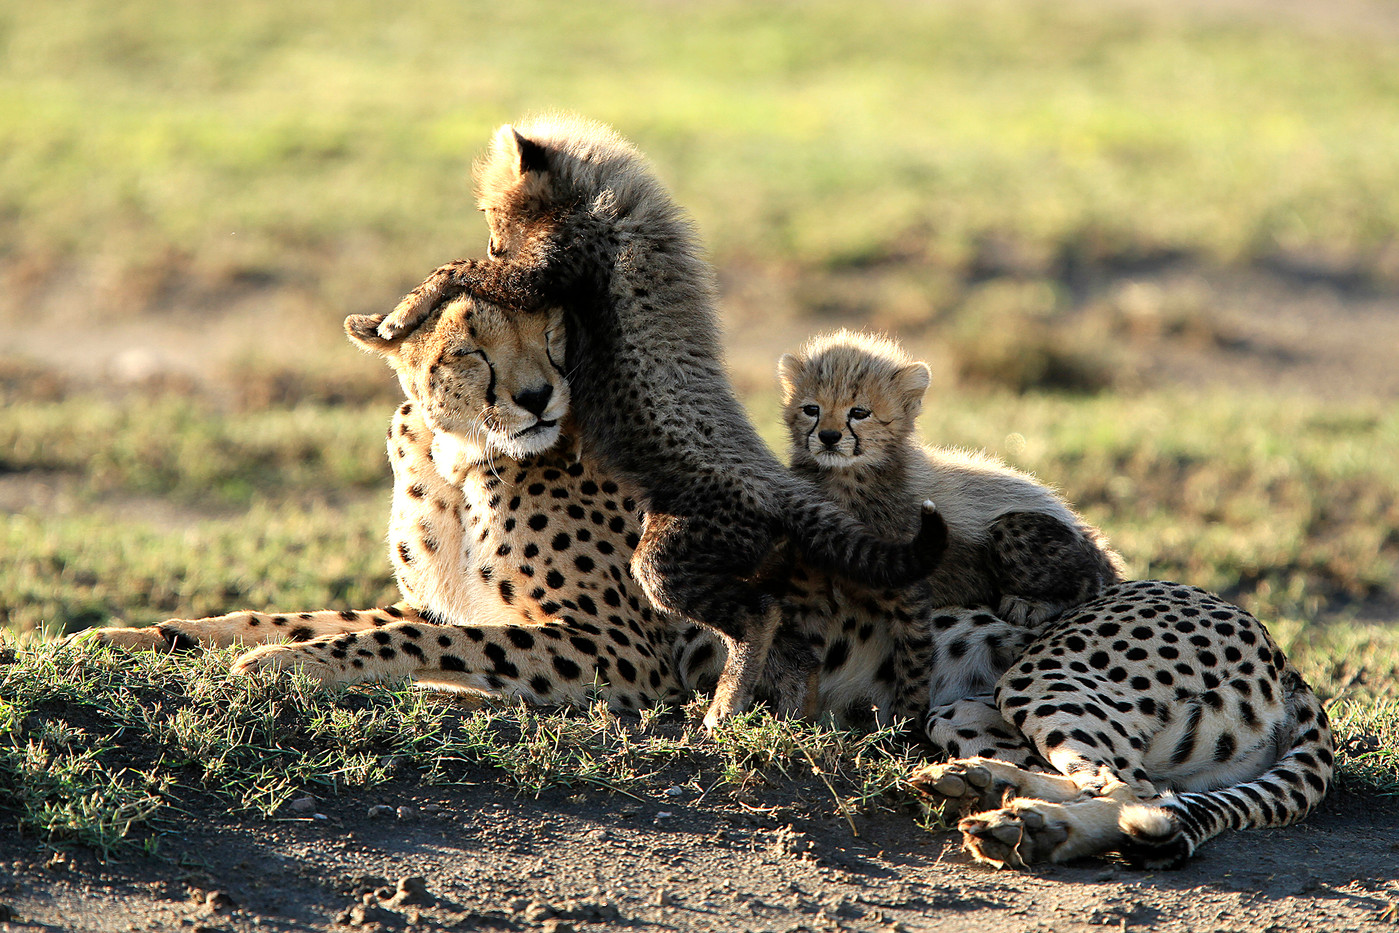 Cheetah & cubs in the Serengeti NP, Tanzania